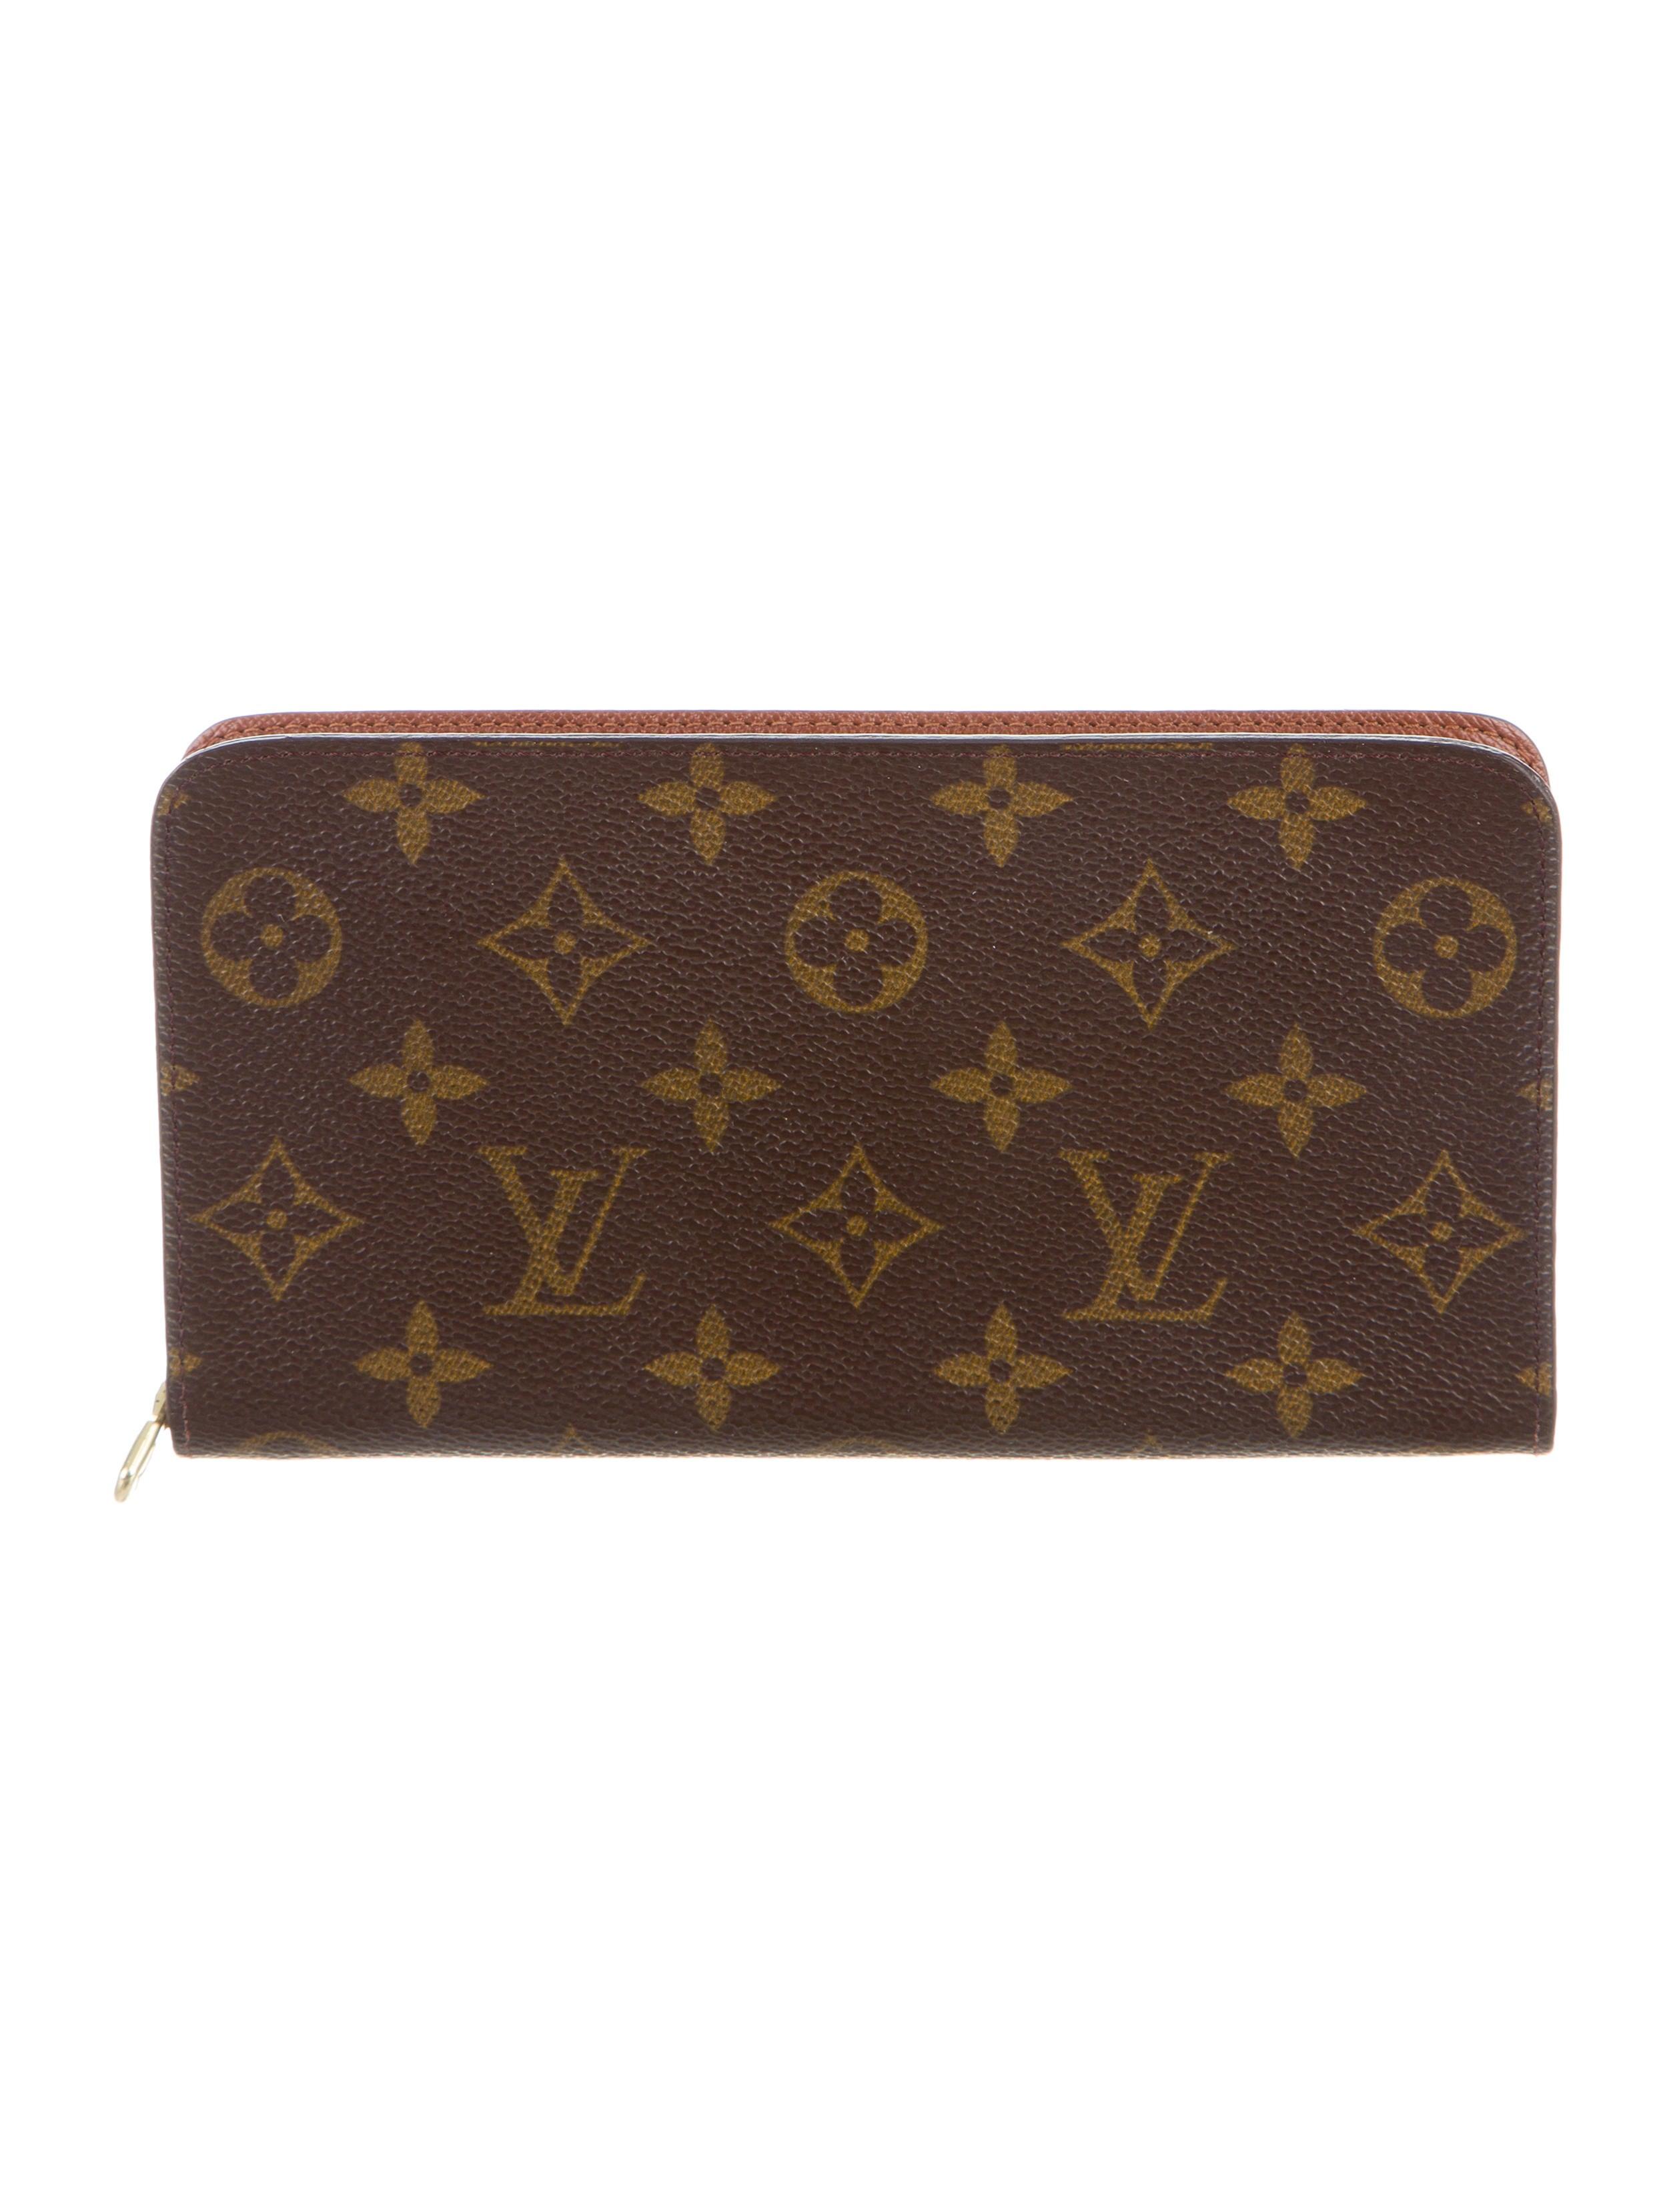 louis vuitton monogram porte monnaie zippe accessories lou106597 the realreal